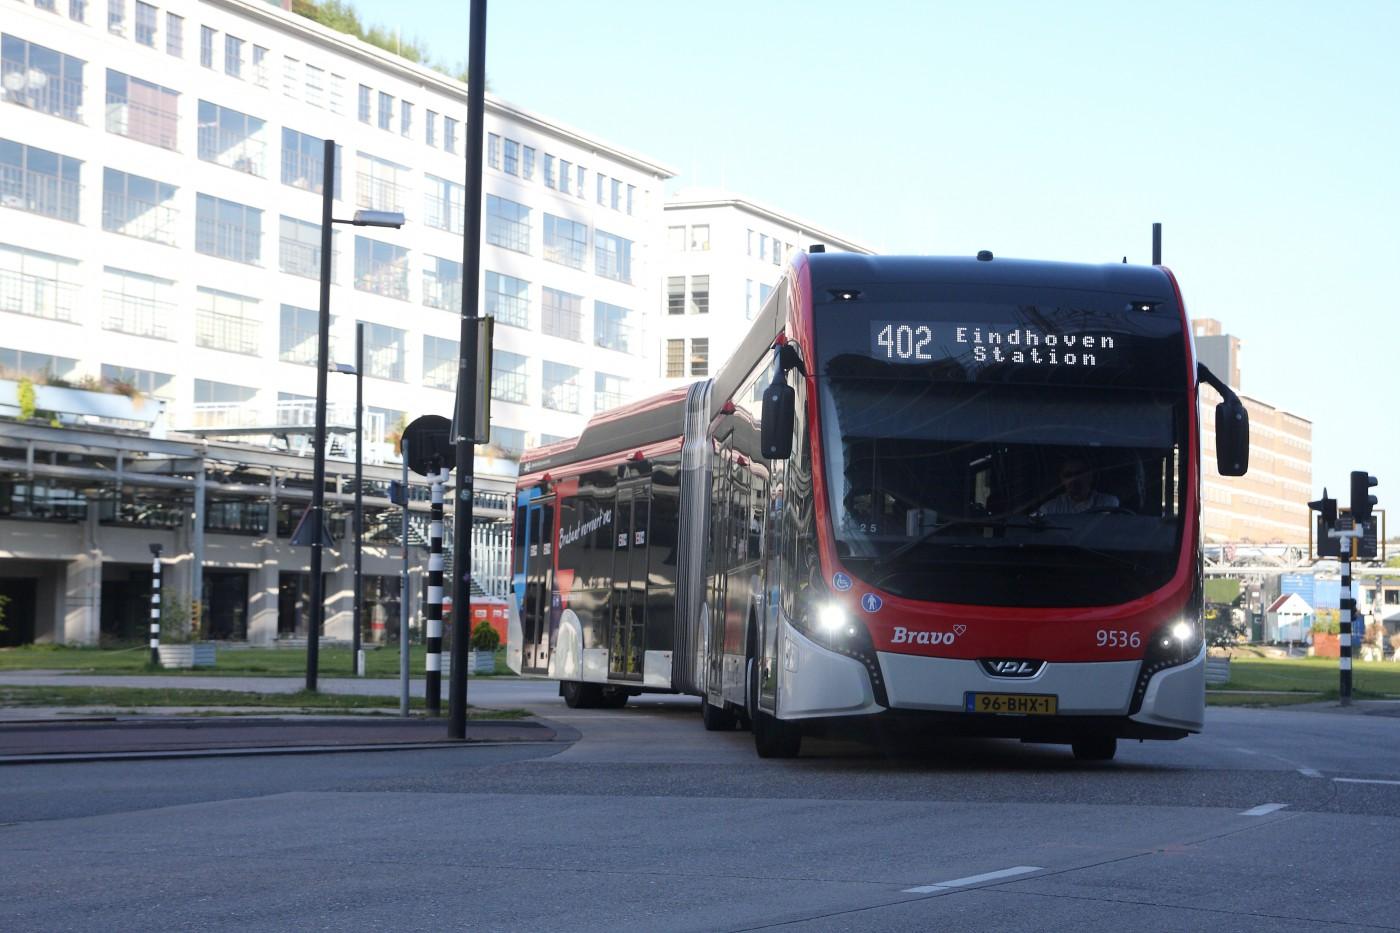 vdl citea slfa-181 electric sustainable bus award 2017